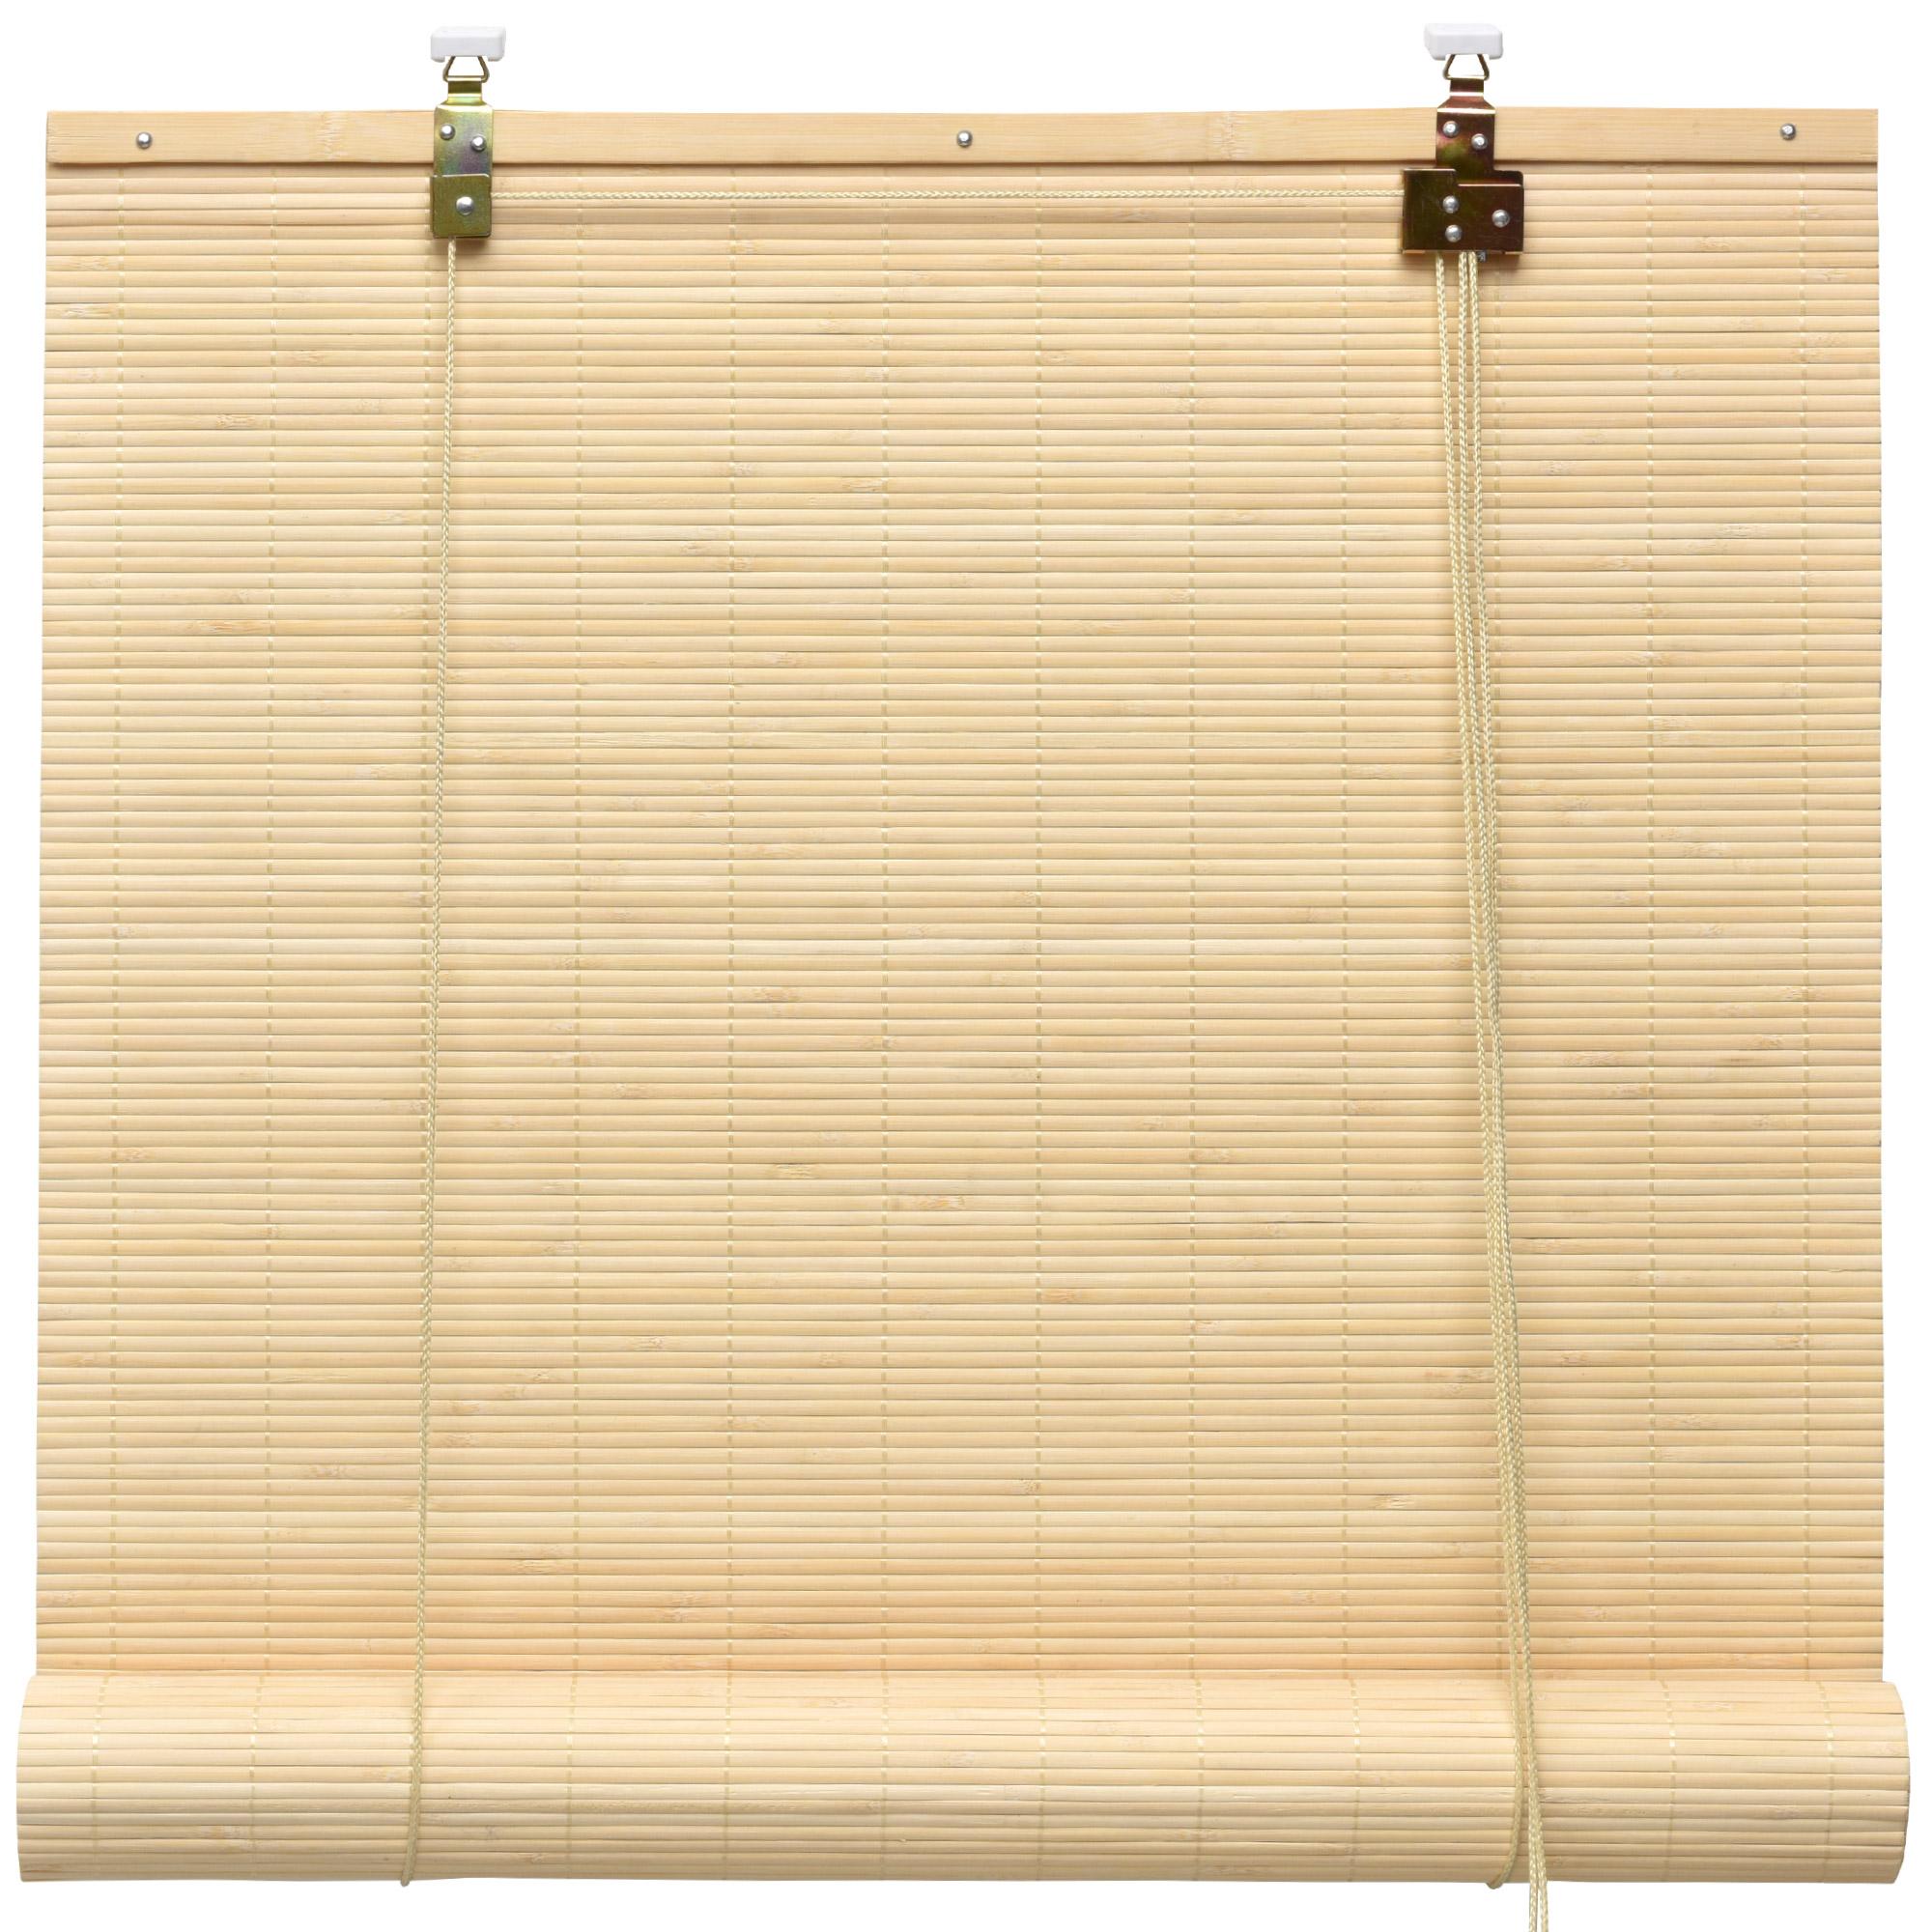 Bambus Holz Rollo Bambusrollo Raffrollo Fenster Sichtschutz Holzrollo Klemmfix Natur